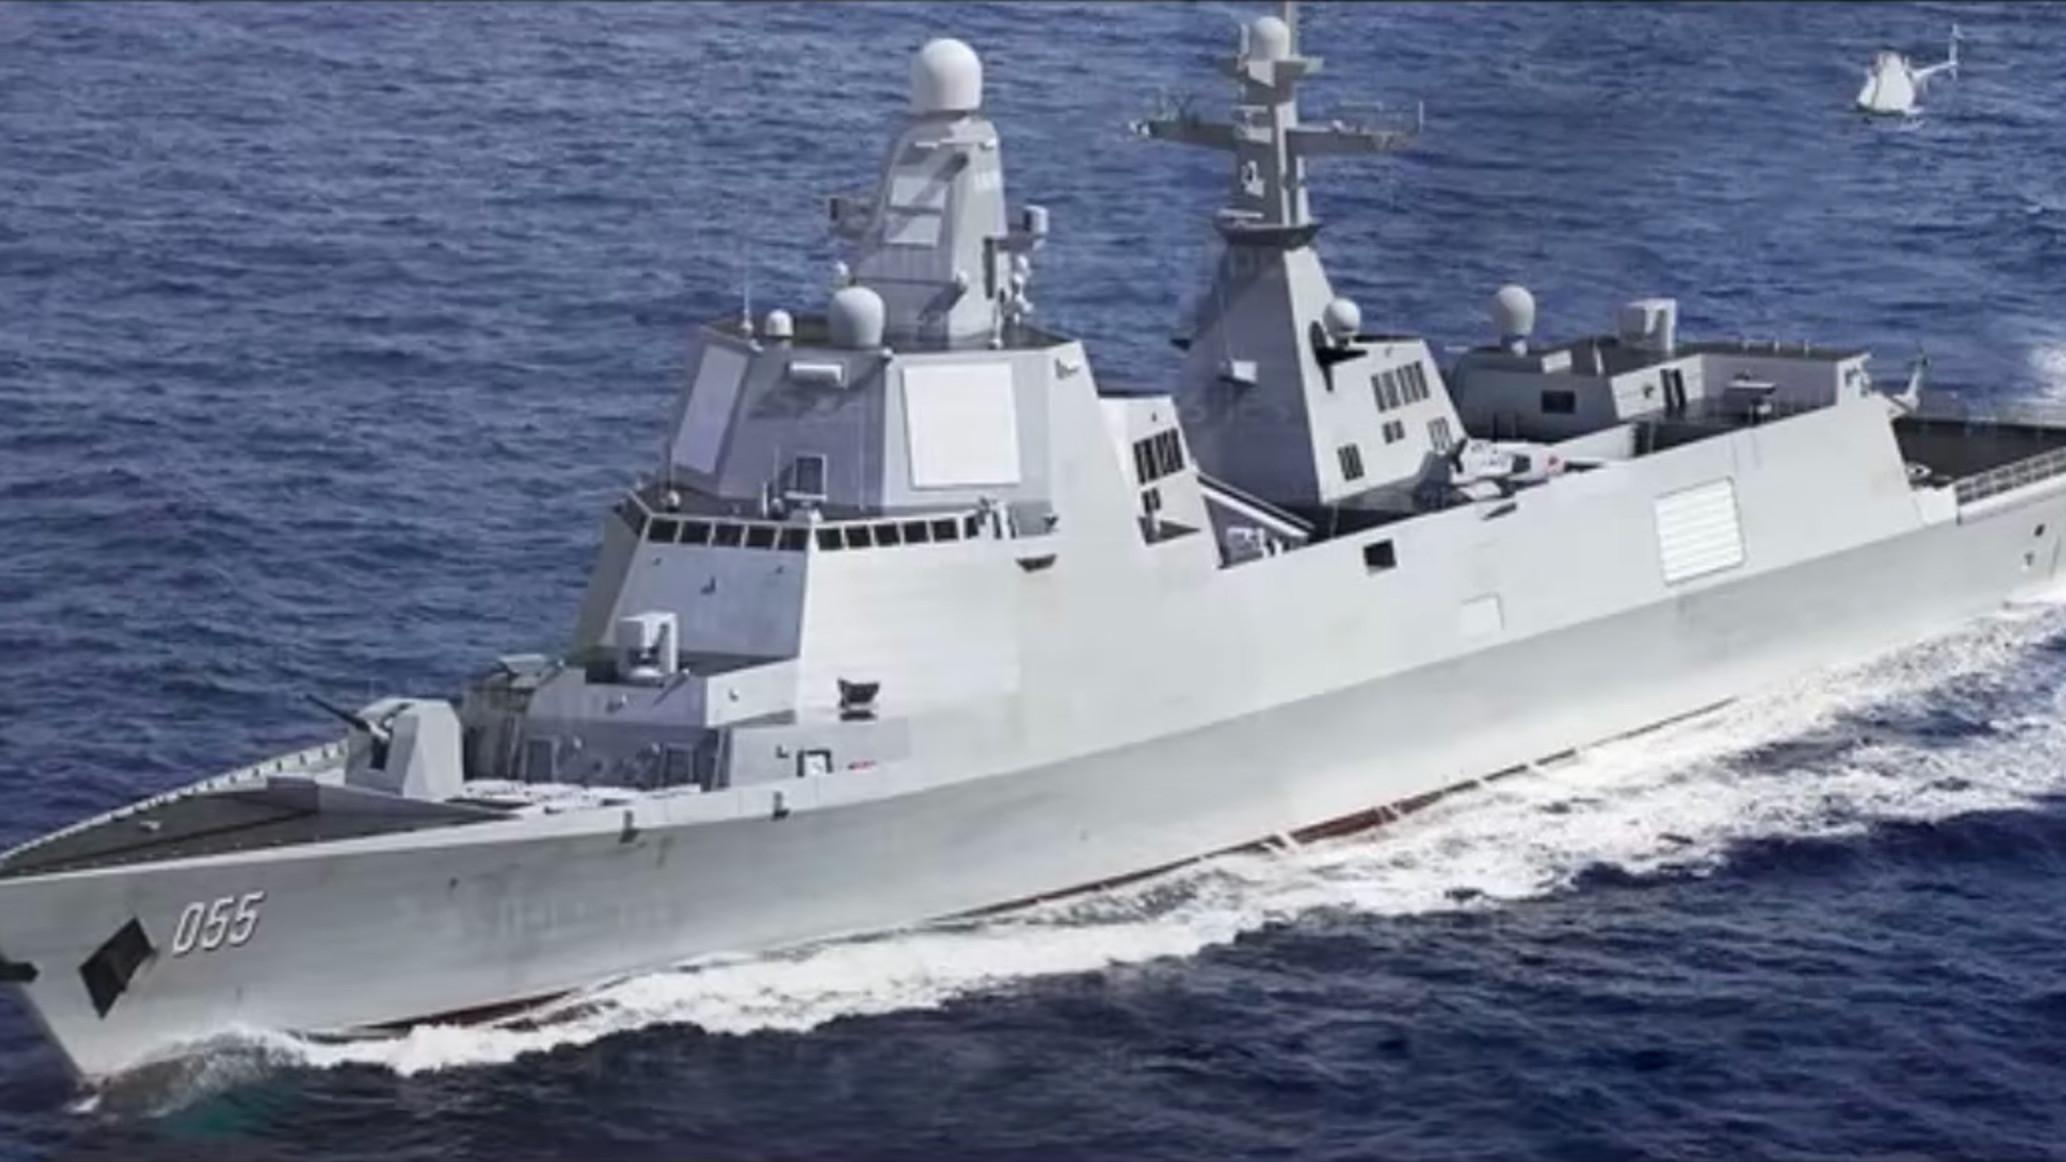 "<p>Кадр видео&nbsp;<a href=""https://www.youtube.com/watch?v=gBCVA254fLA"" target=""_blank"">Type 055 Destroyer , China's next AEGIS Destroyer/Cruiser</a>. Скриншот &copy; L!FE</p>"